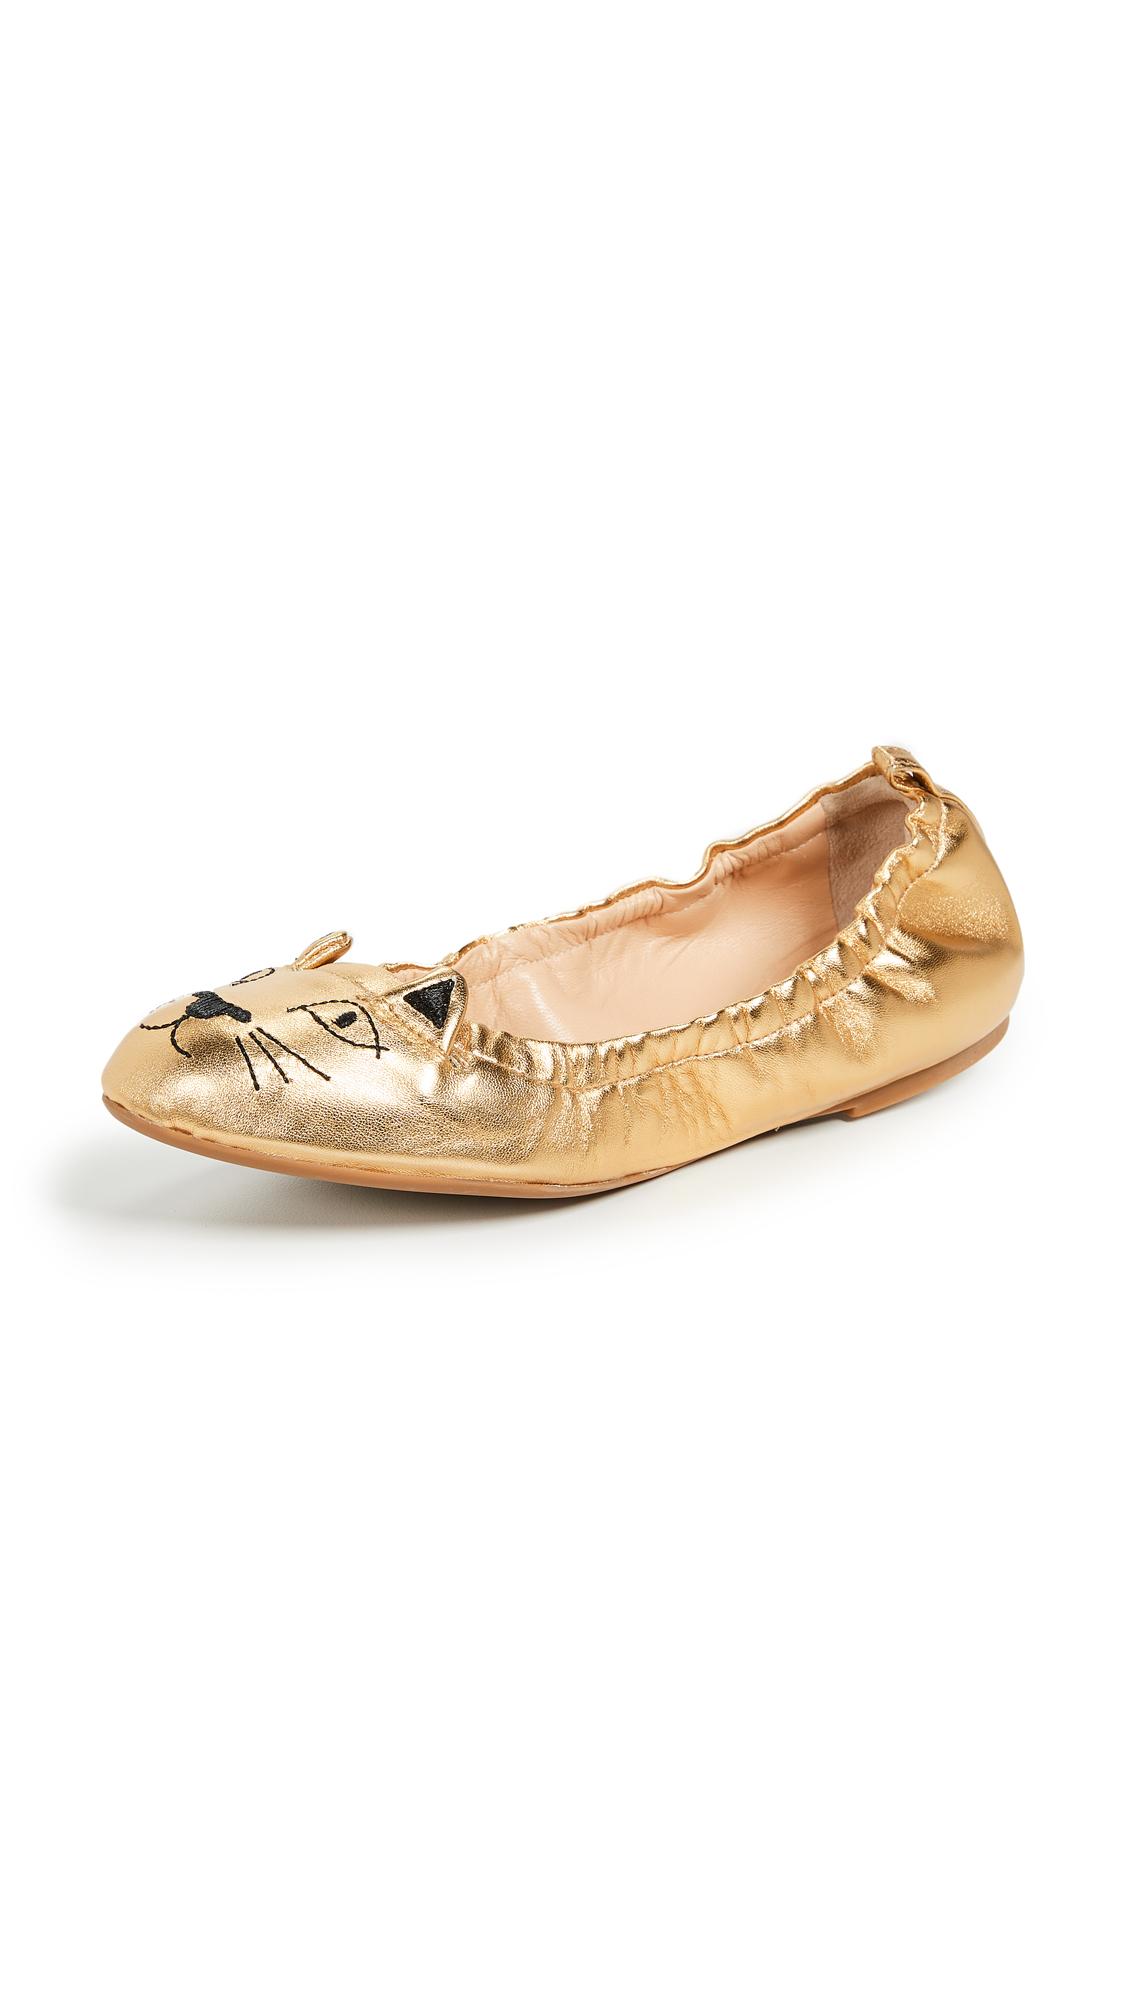 Charlotte Olympia Kitty Ballerina Flats - Gold